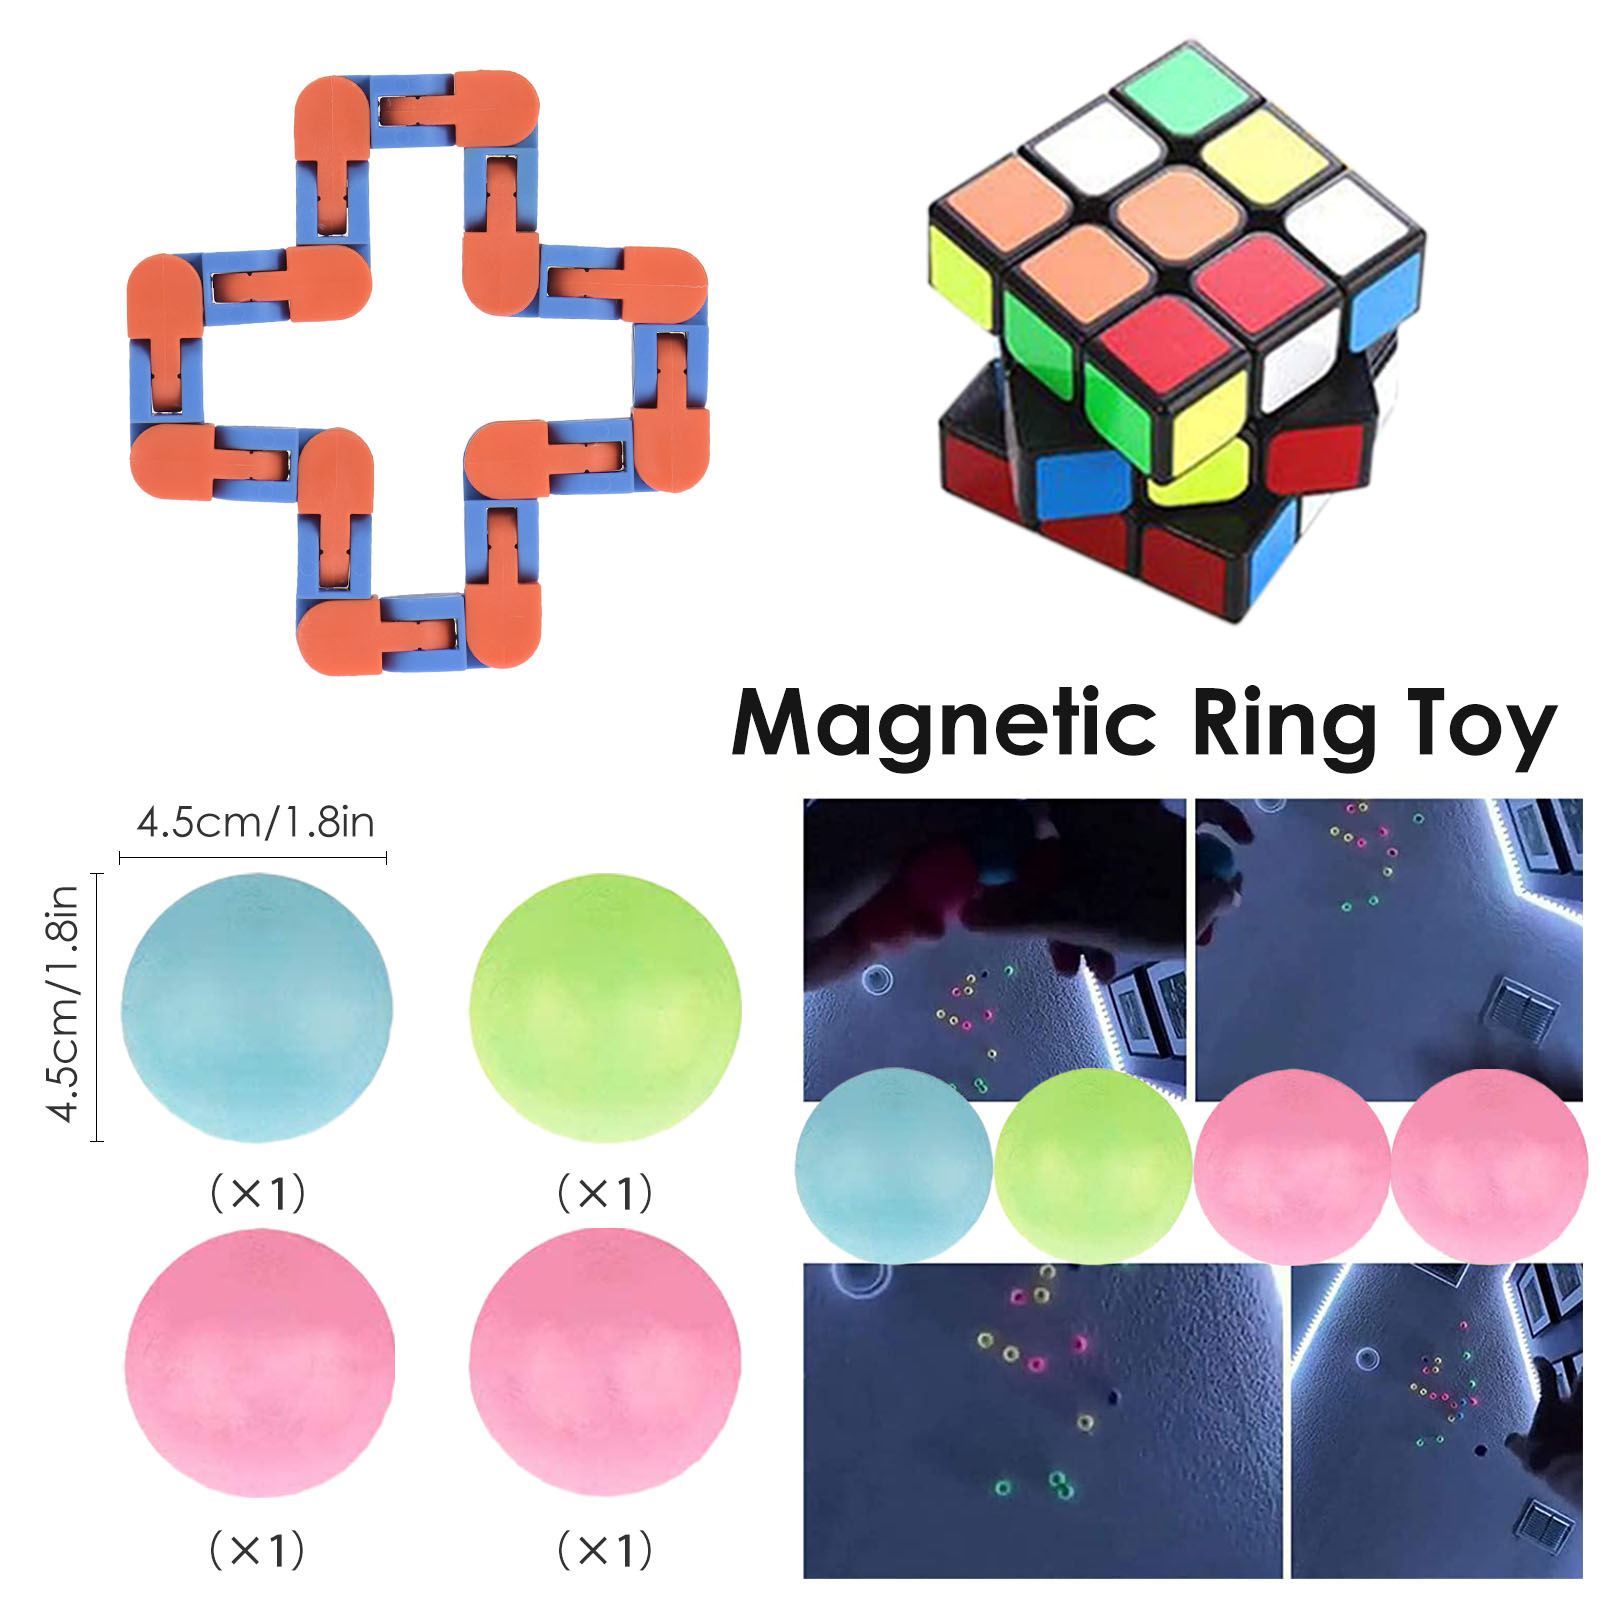 Fidget Toys Anti Stress Toy Set Stretchy Strings Mesh Marble Fidget Toys Set 28PCS Stress Anxiety Relief Sensory Toy enlarge